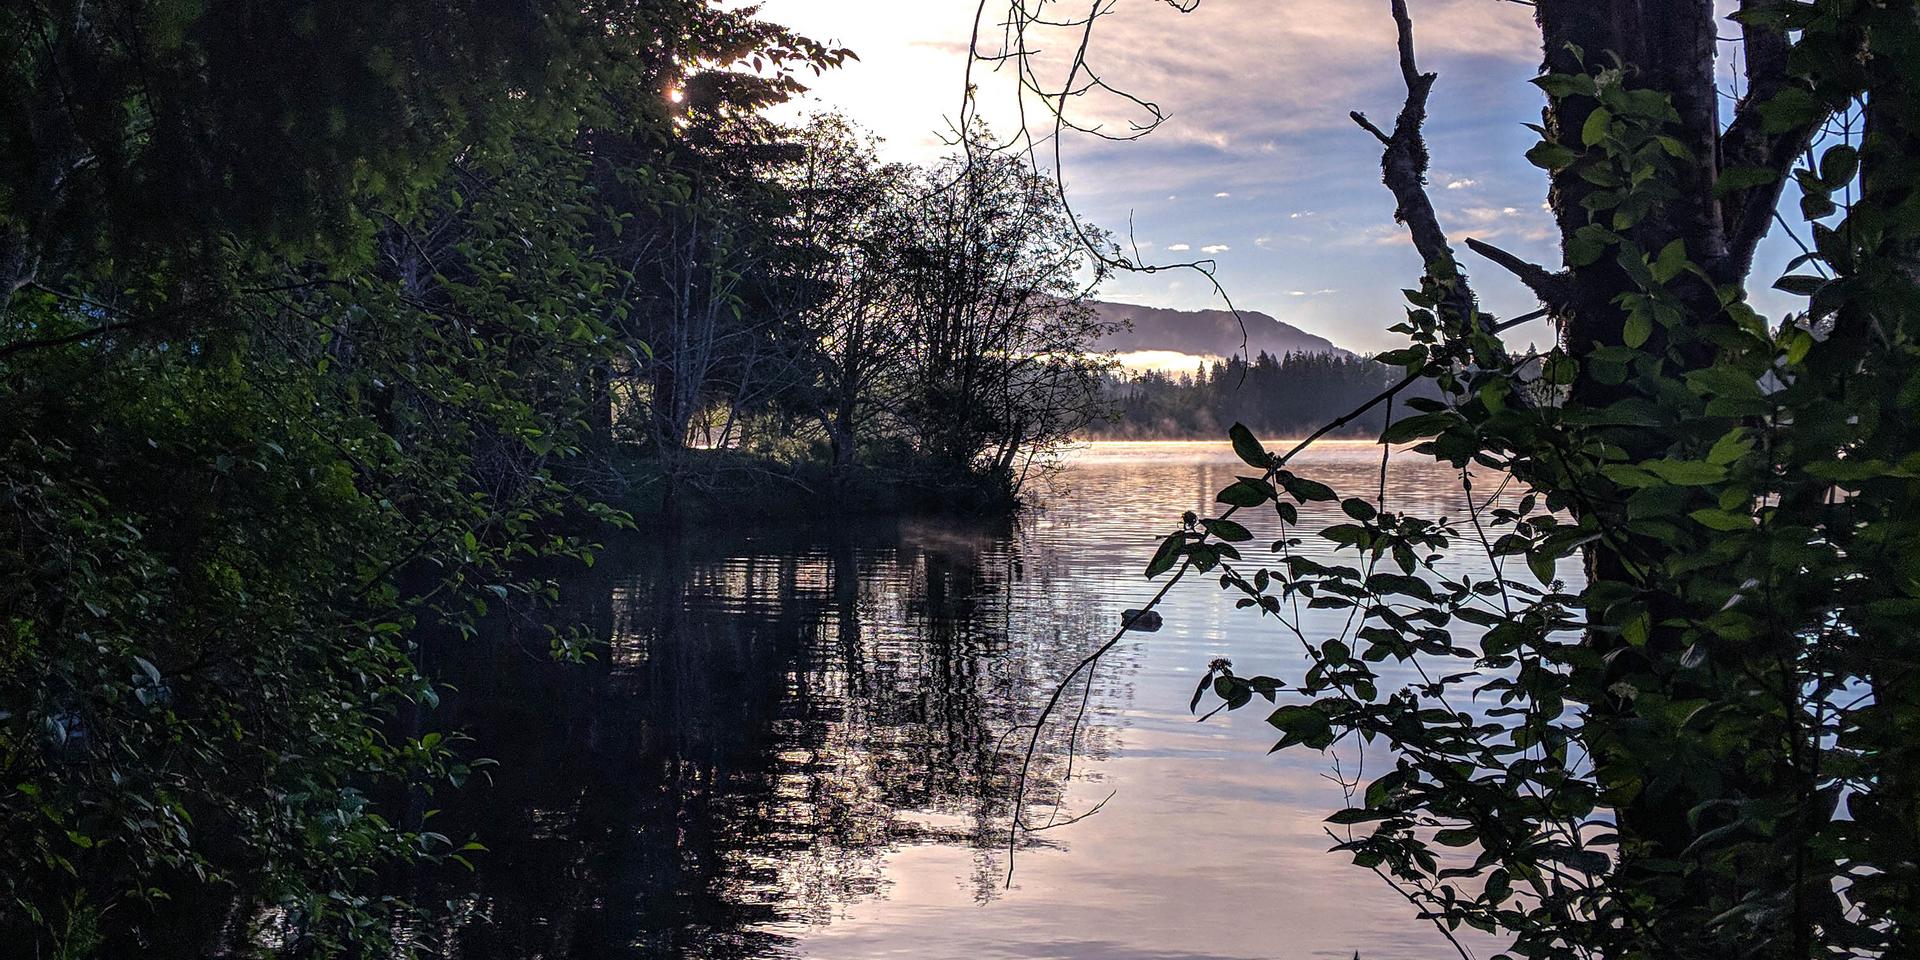 Mesachie Lake Reflection